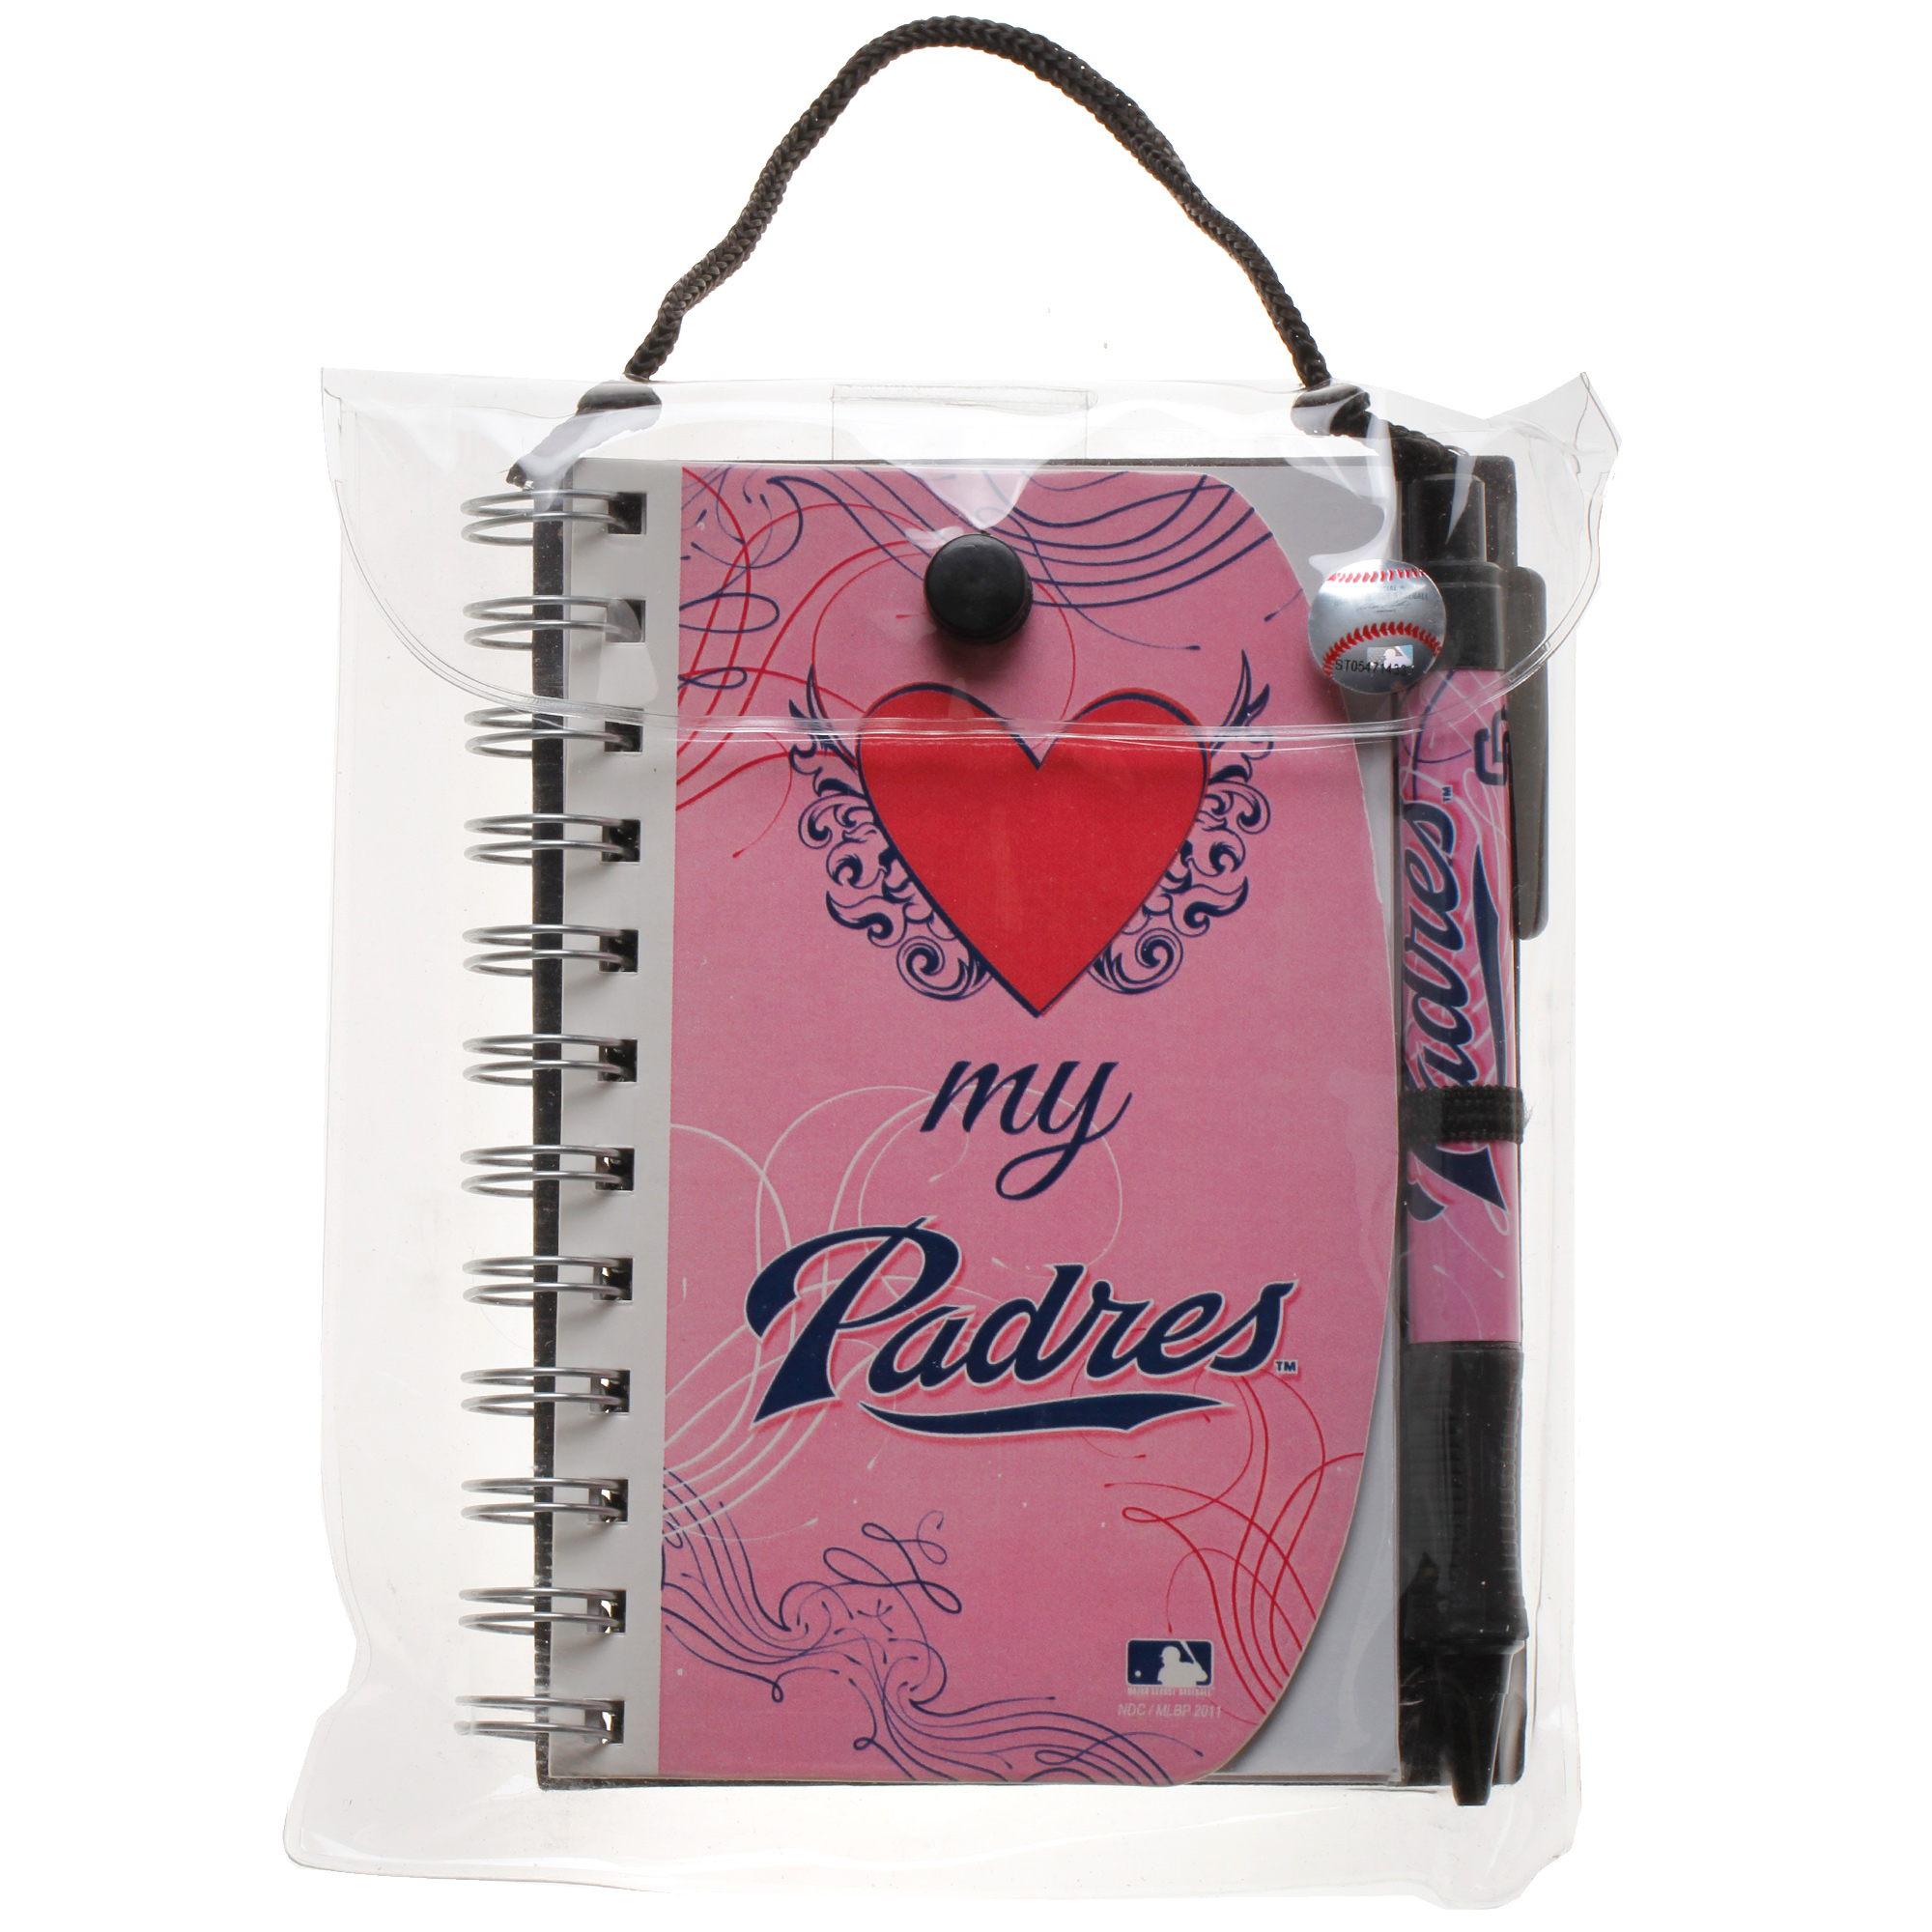 San Diego Padres Journal Set - Pink - No Size